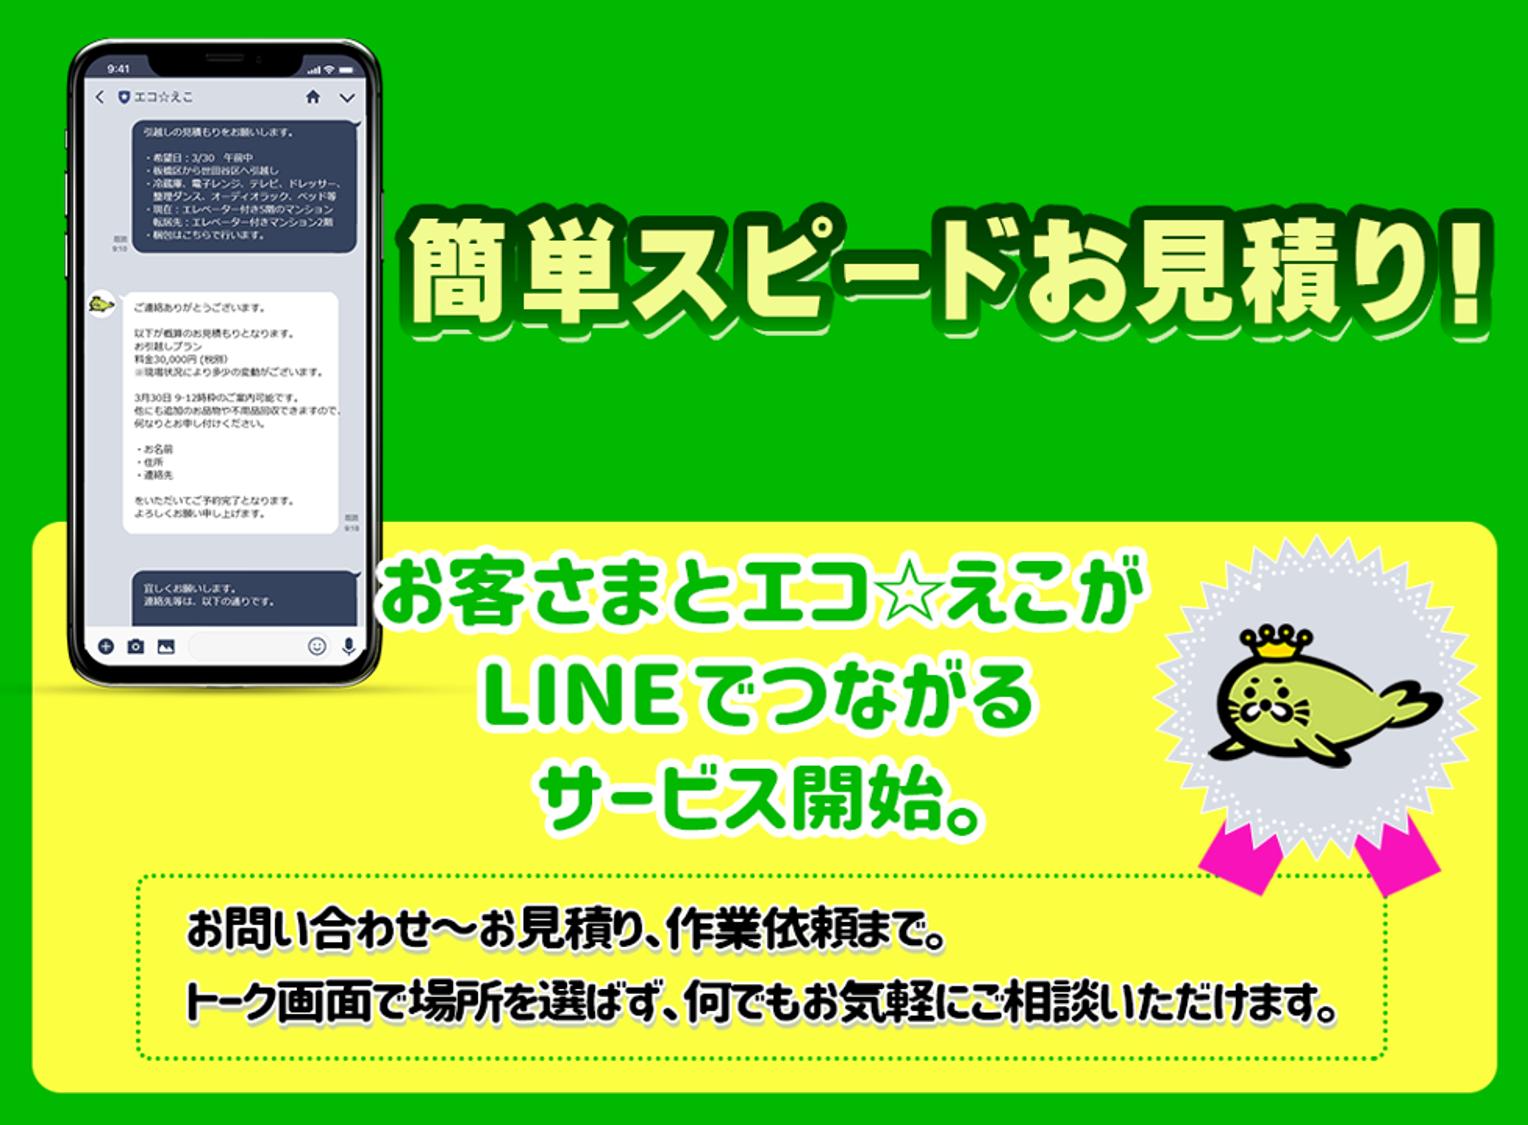 LINEアプリでもお見積りできます!